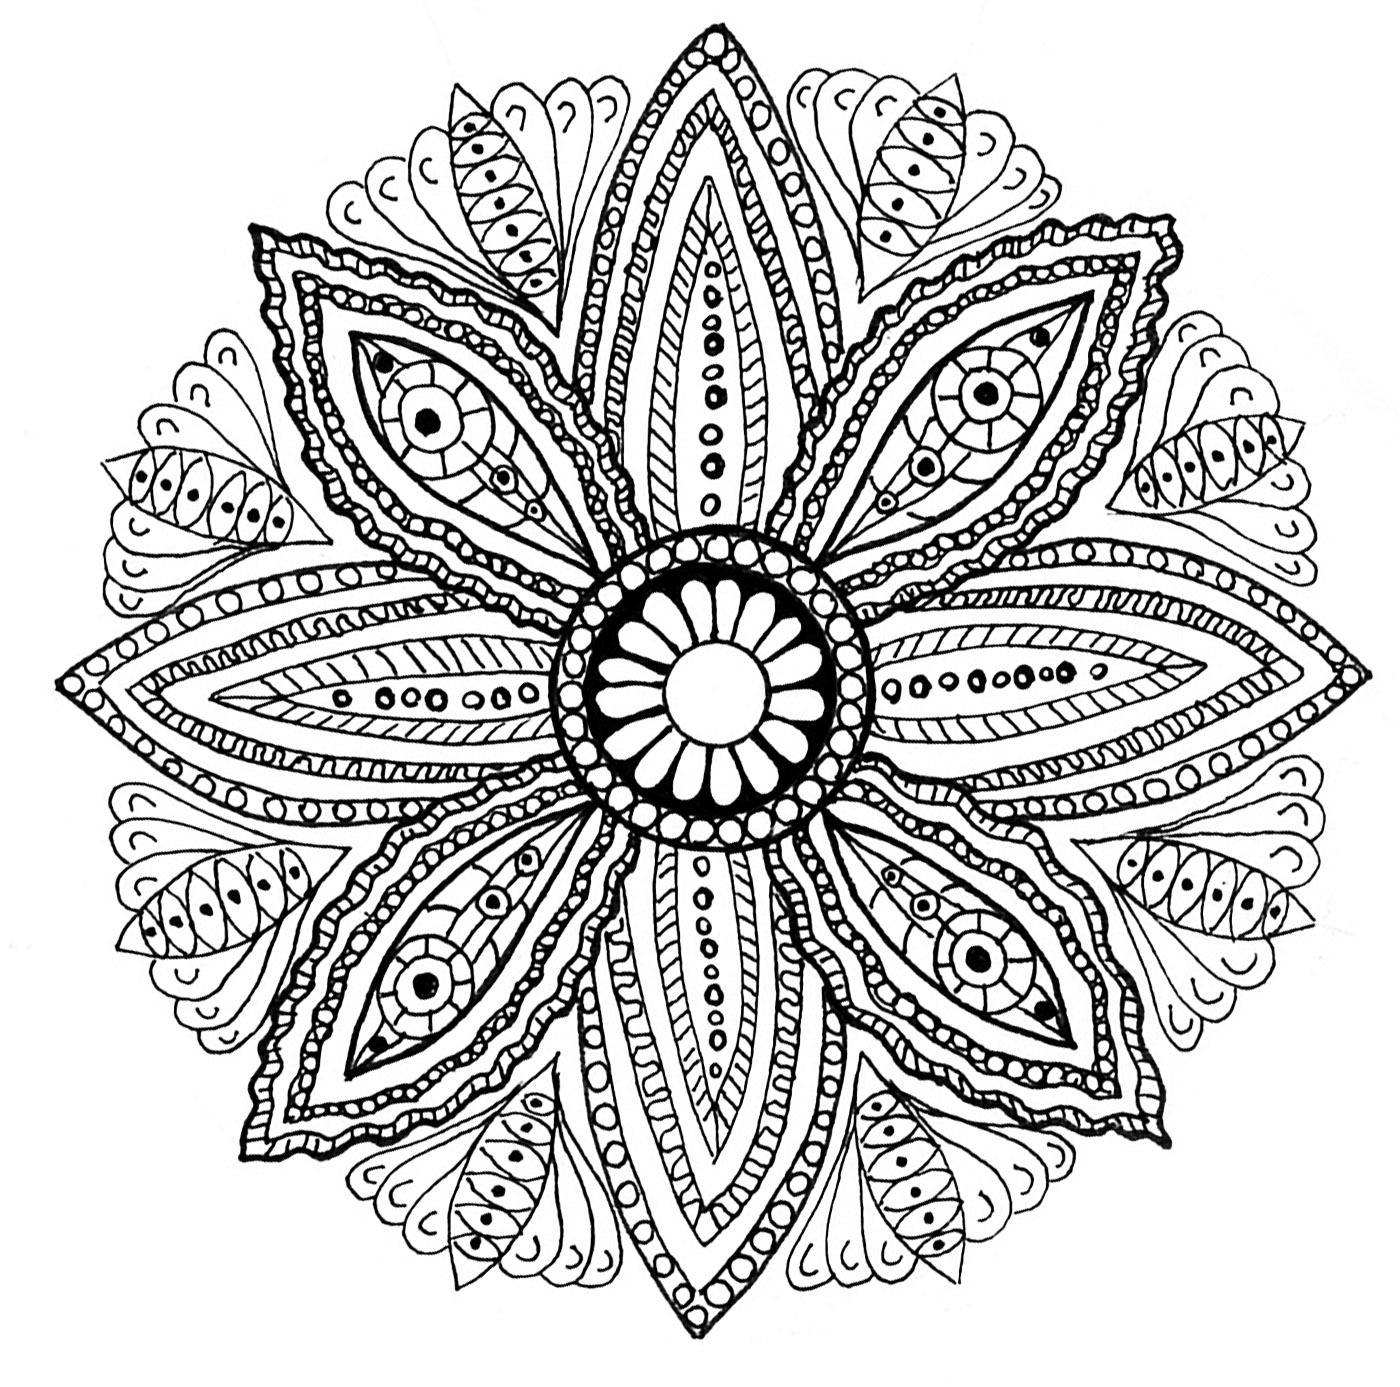 Imagenes Mandala Para Colorear (59) - Orientación Andújar pour Coloriage Mandala A Imprimer